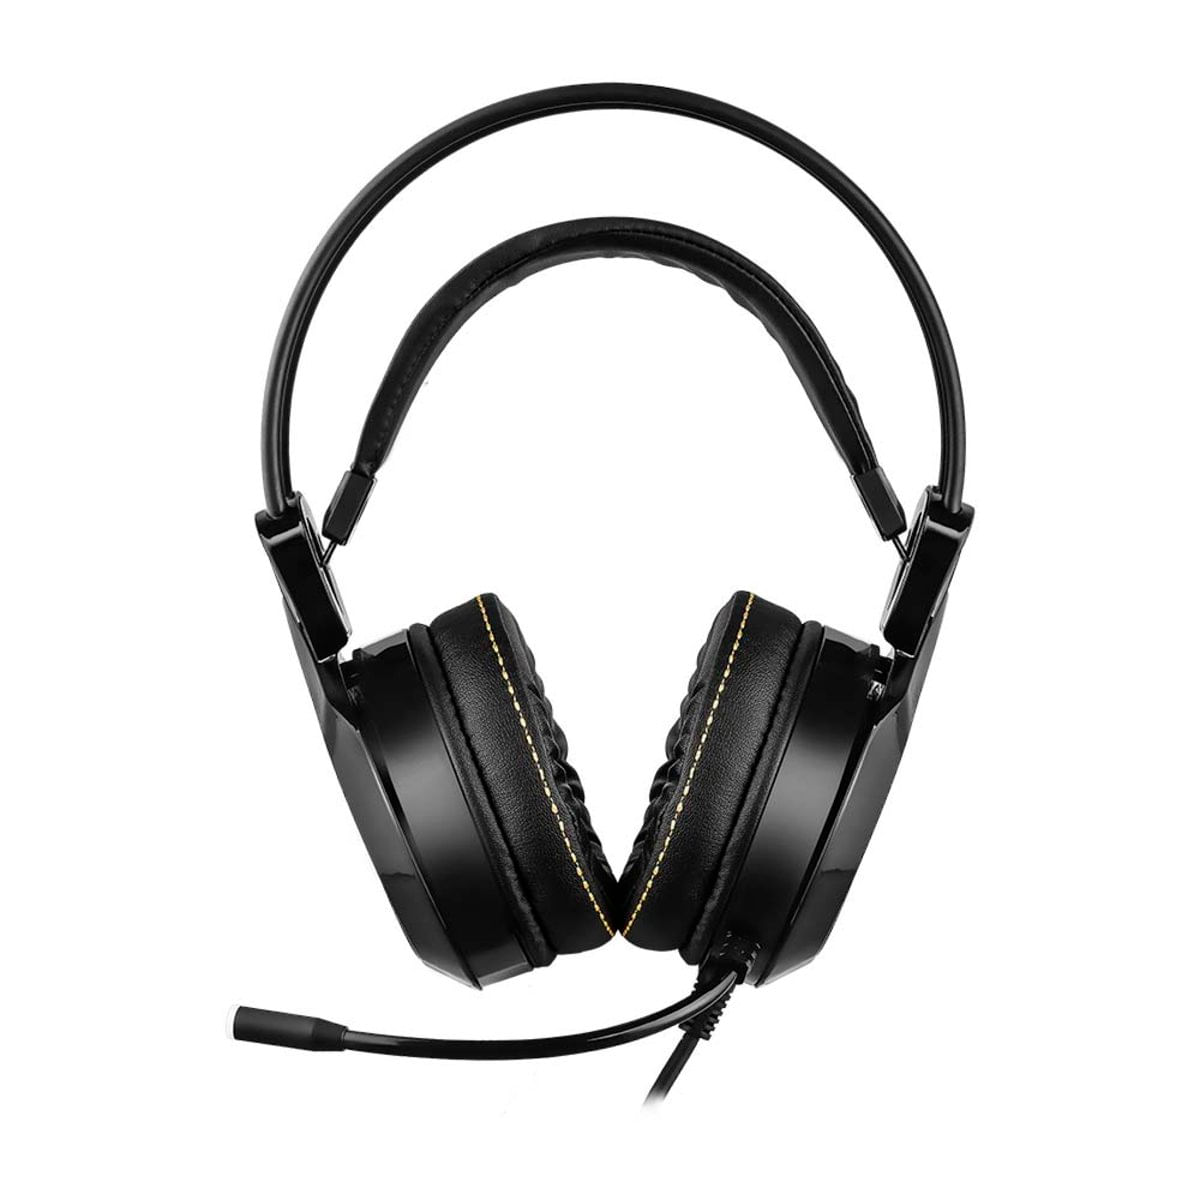 Fone de Ouvido Headset Gamer Thyra Rgb 7.1 Multilaser Ph290